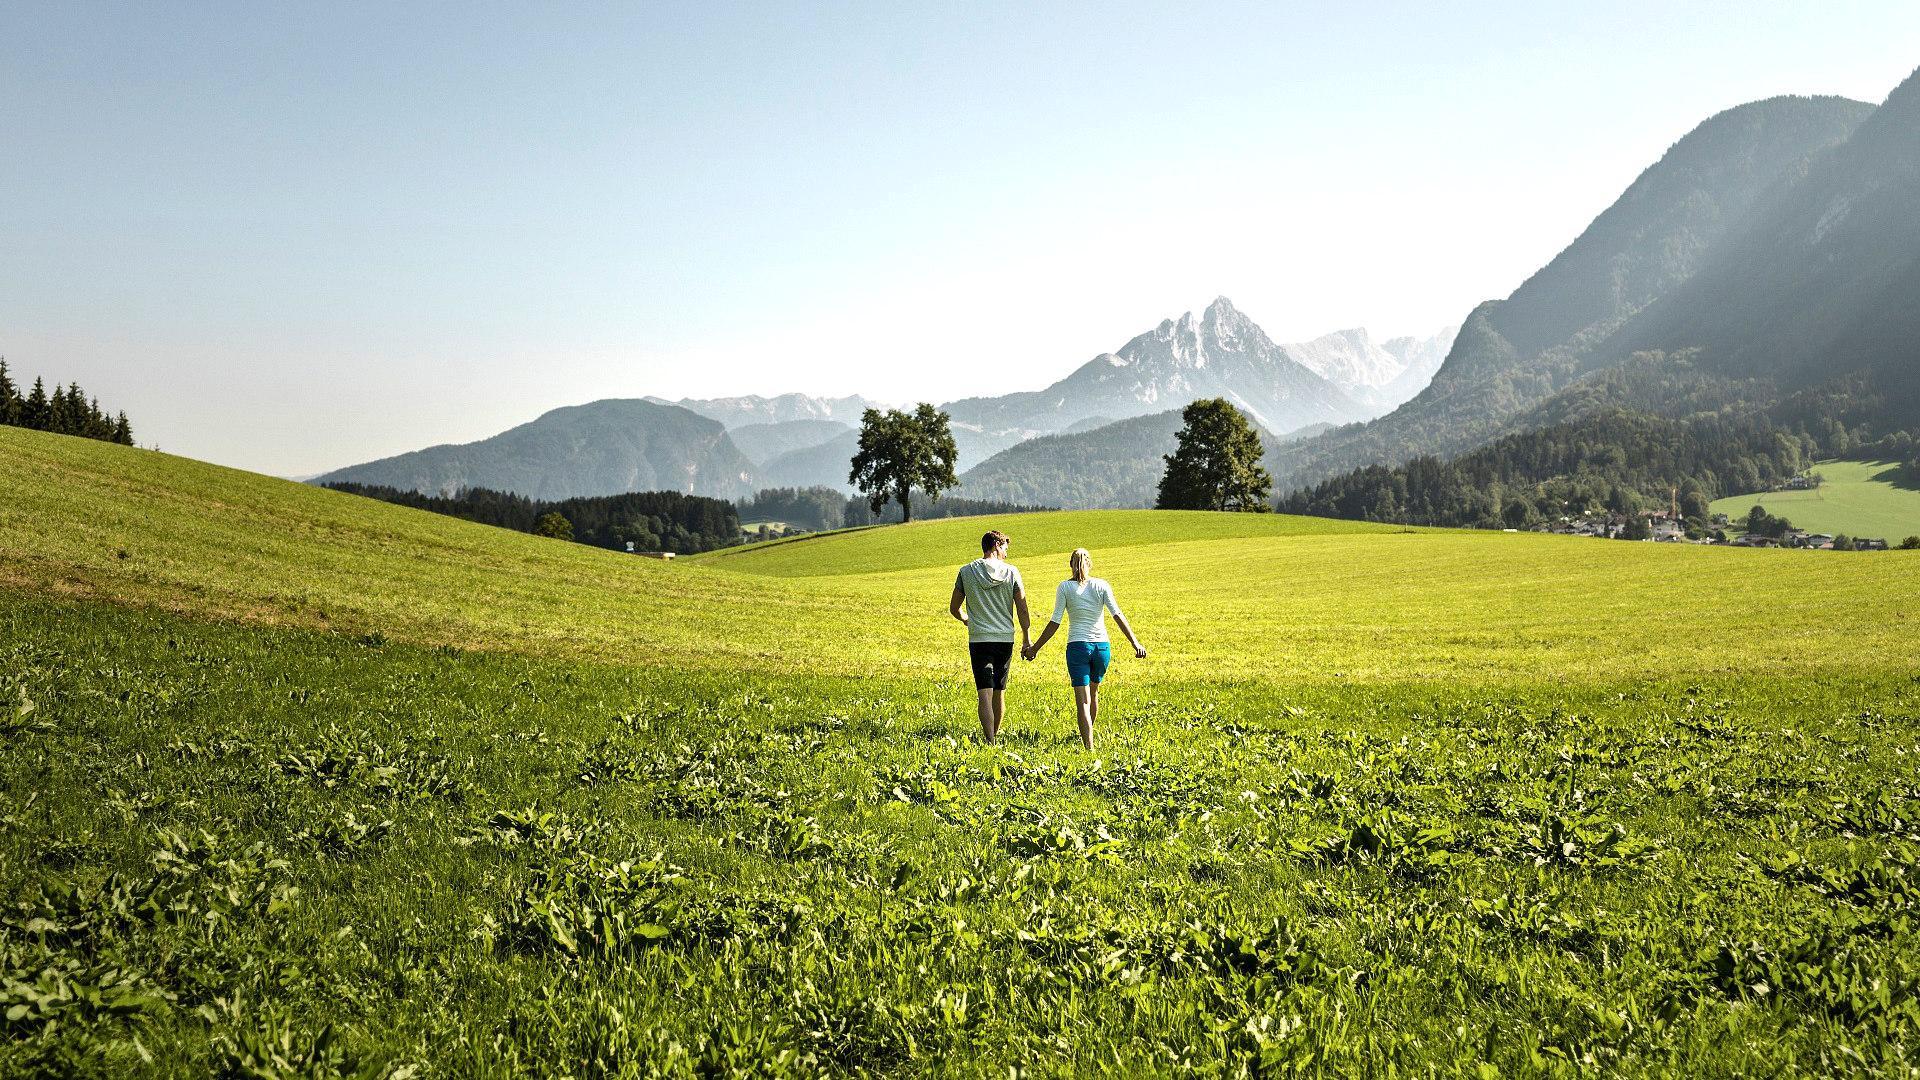 ledererhof-gasthof-pension-ebbs-zimmer-hotel-tirol-berge-spazieren